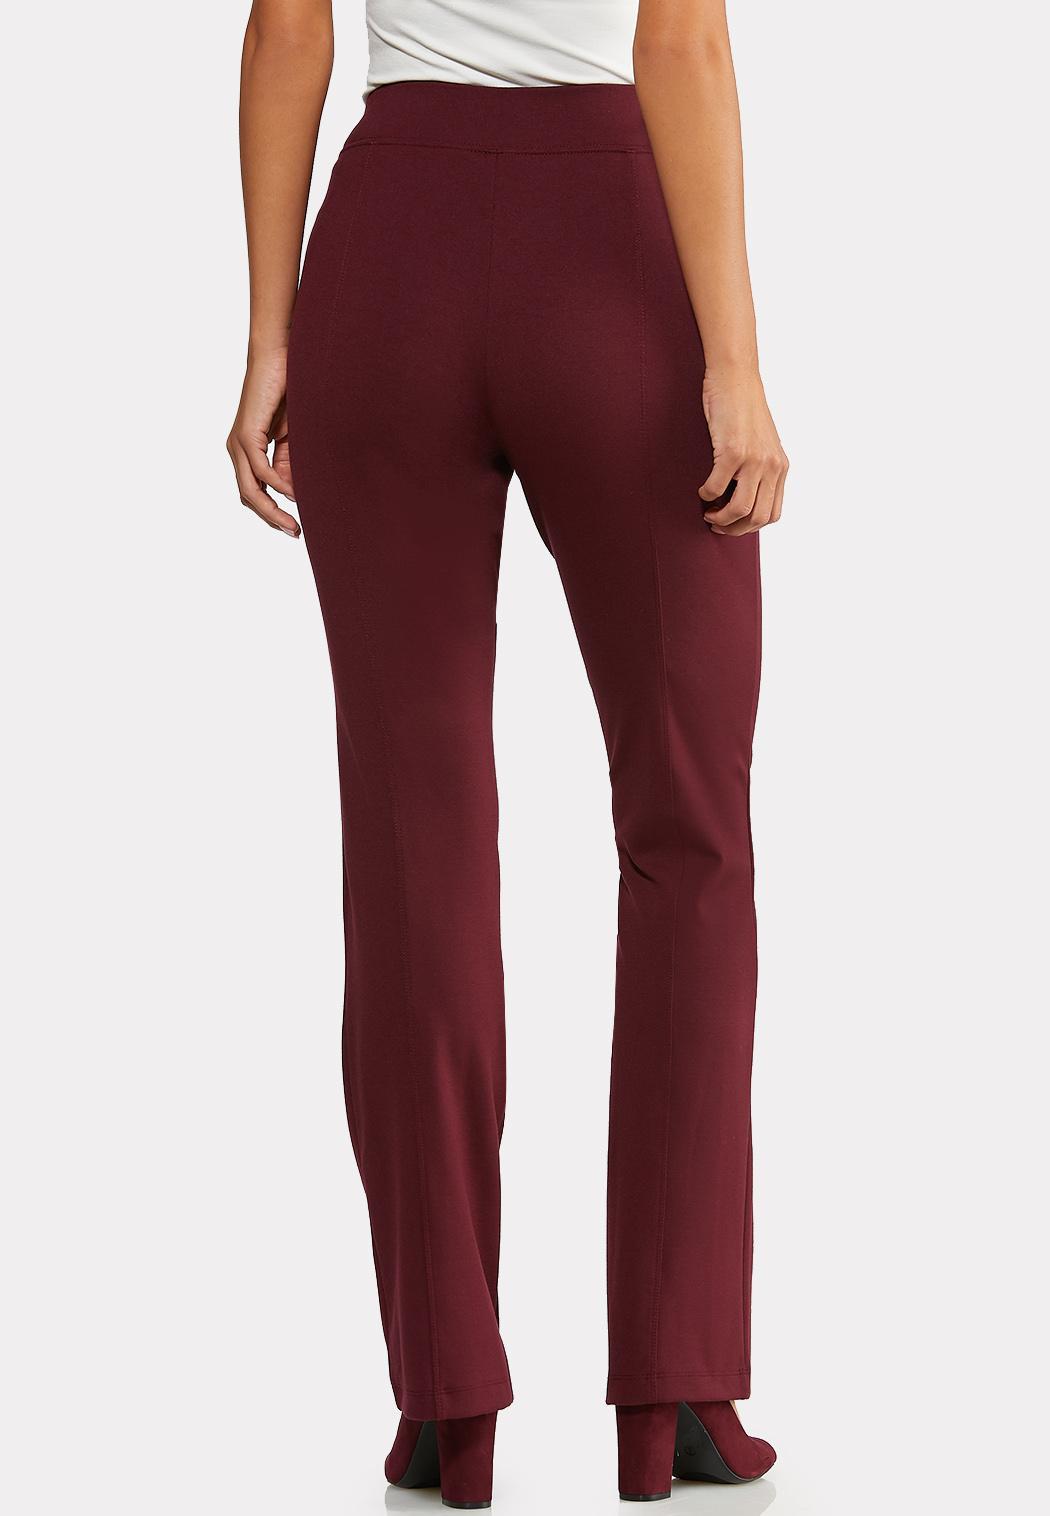 Petite Slim Bootcut Ponte Pants (Item #43956799)